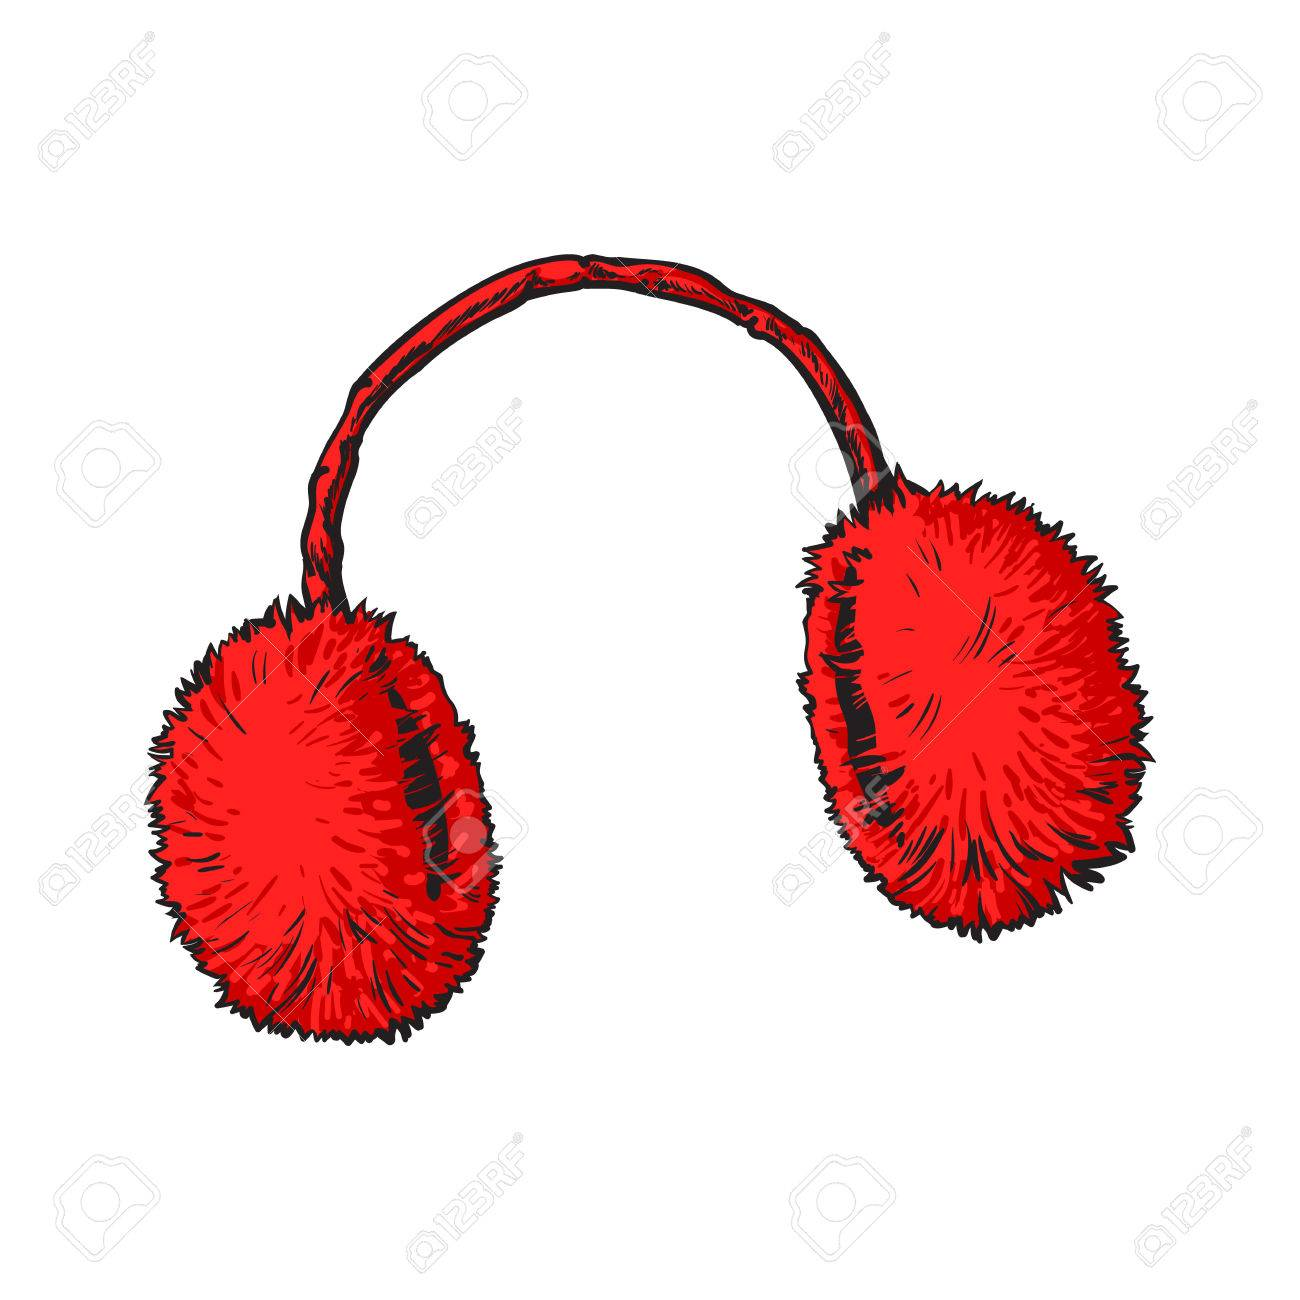 Ear muffs clip art free